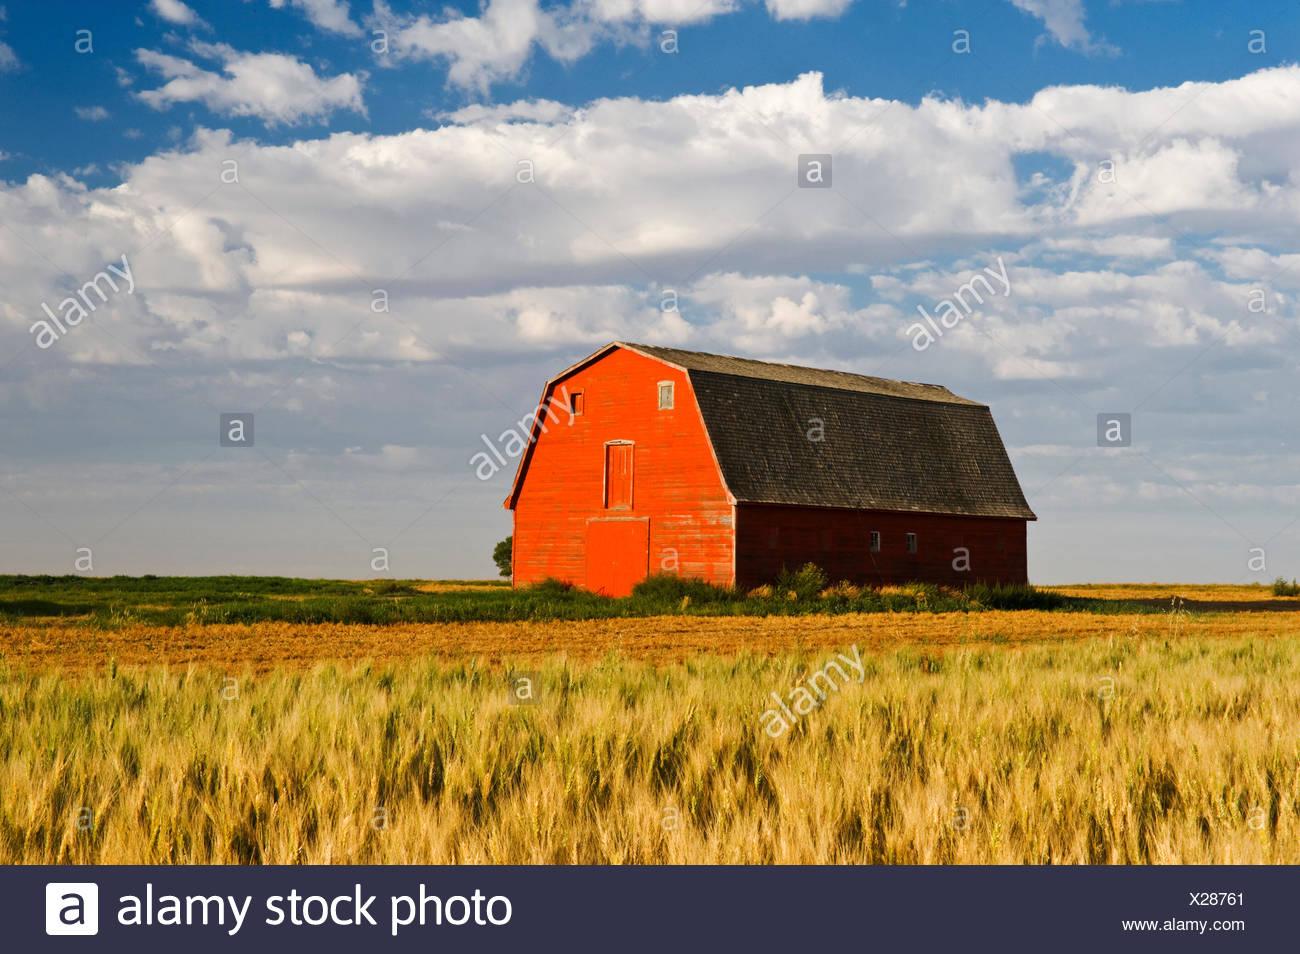 old red barn next to wheat field, near Elrose, Saskatchewan, Canada - Stock Image